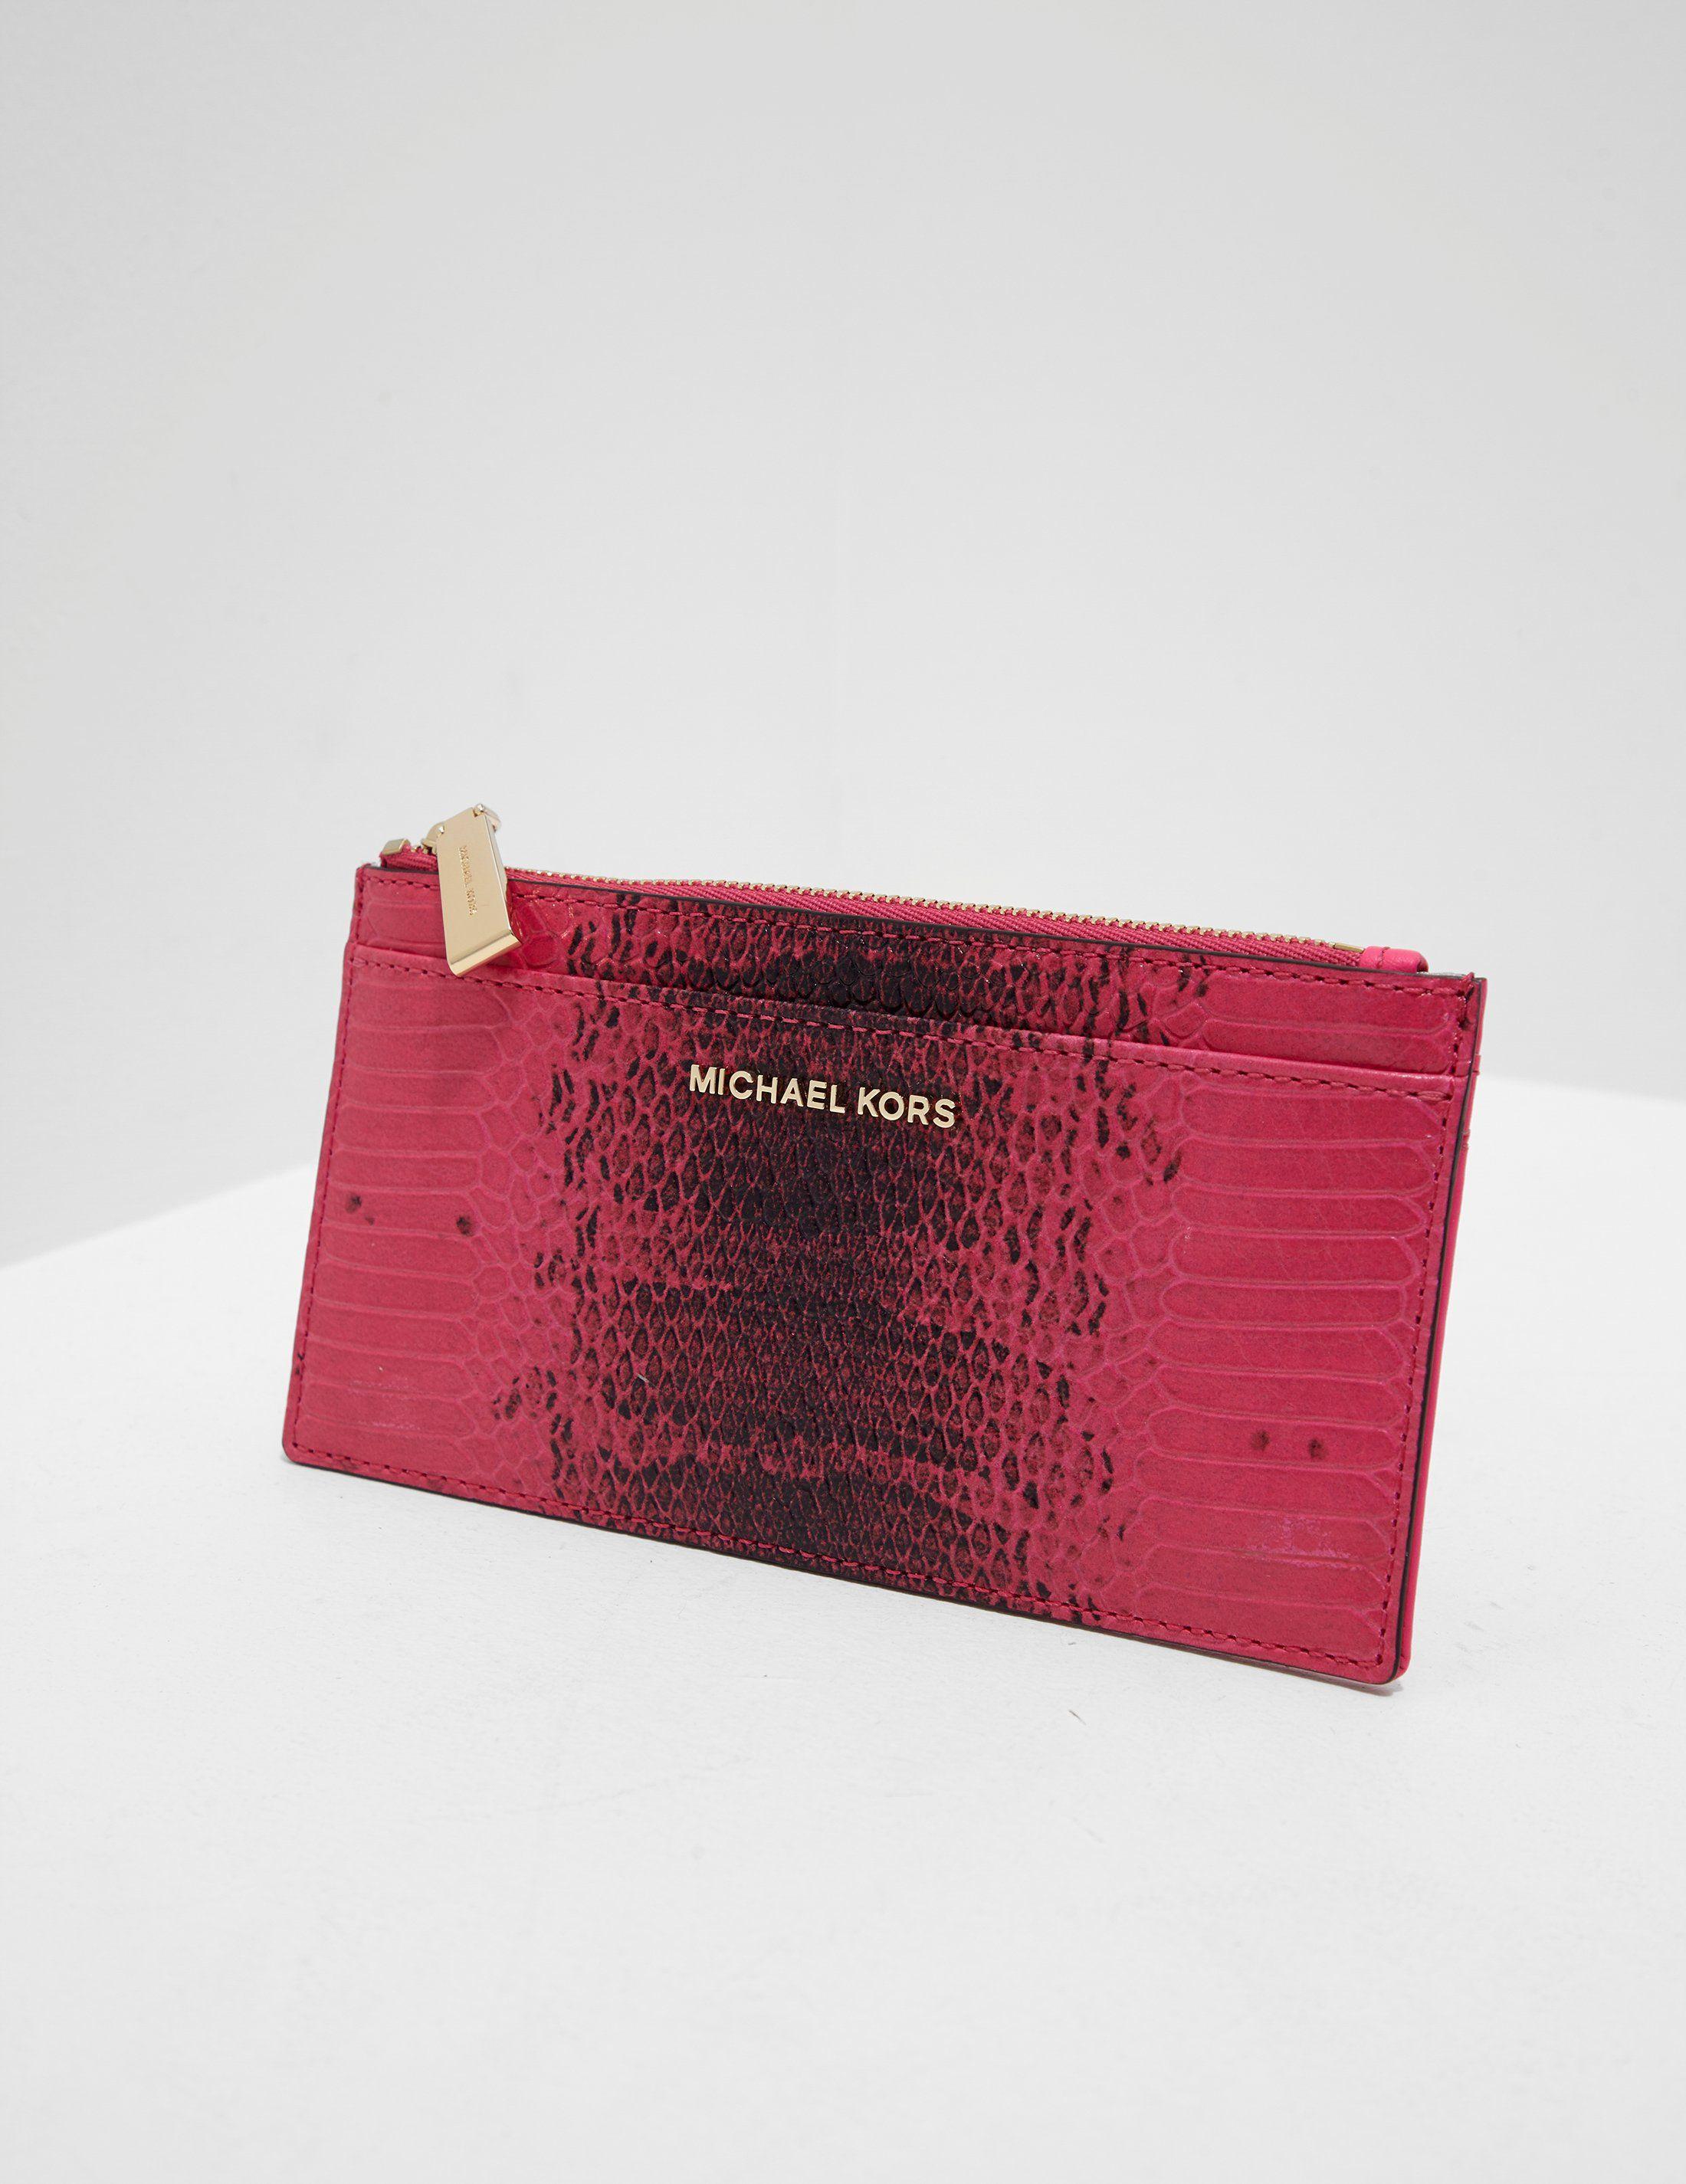 Michael Kors Slim Card Case - Online Exclusive